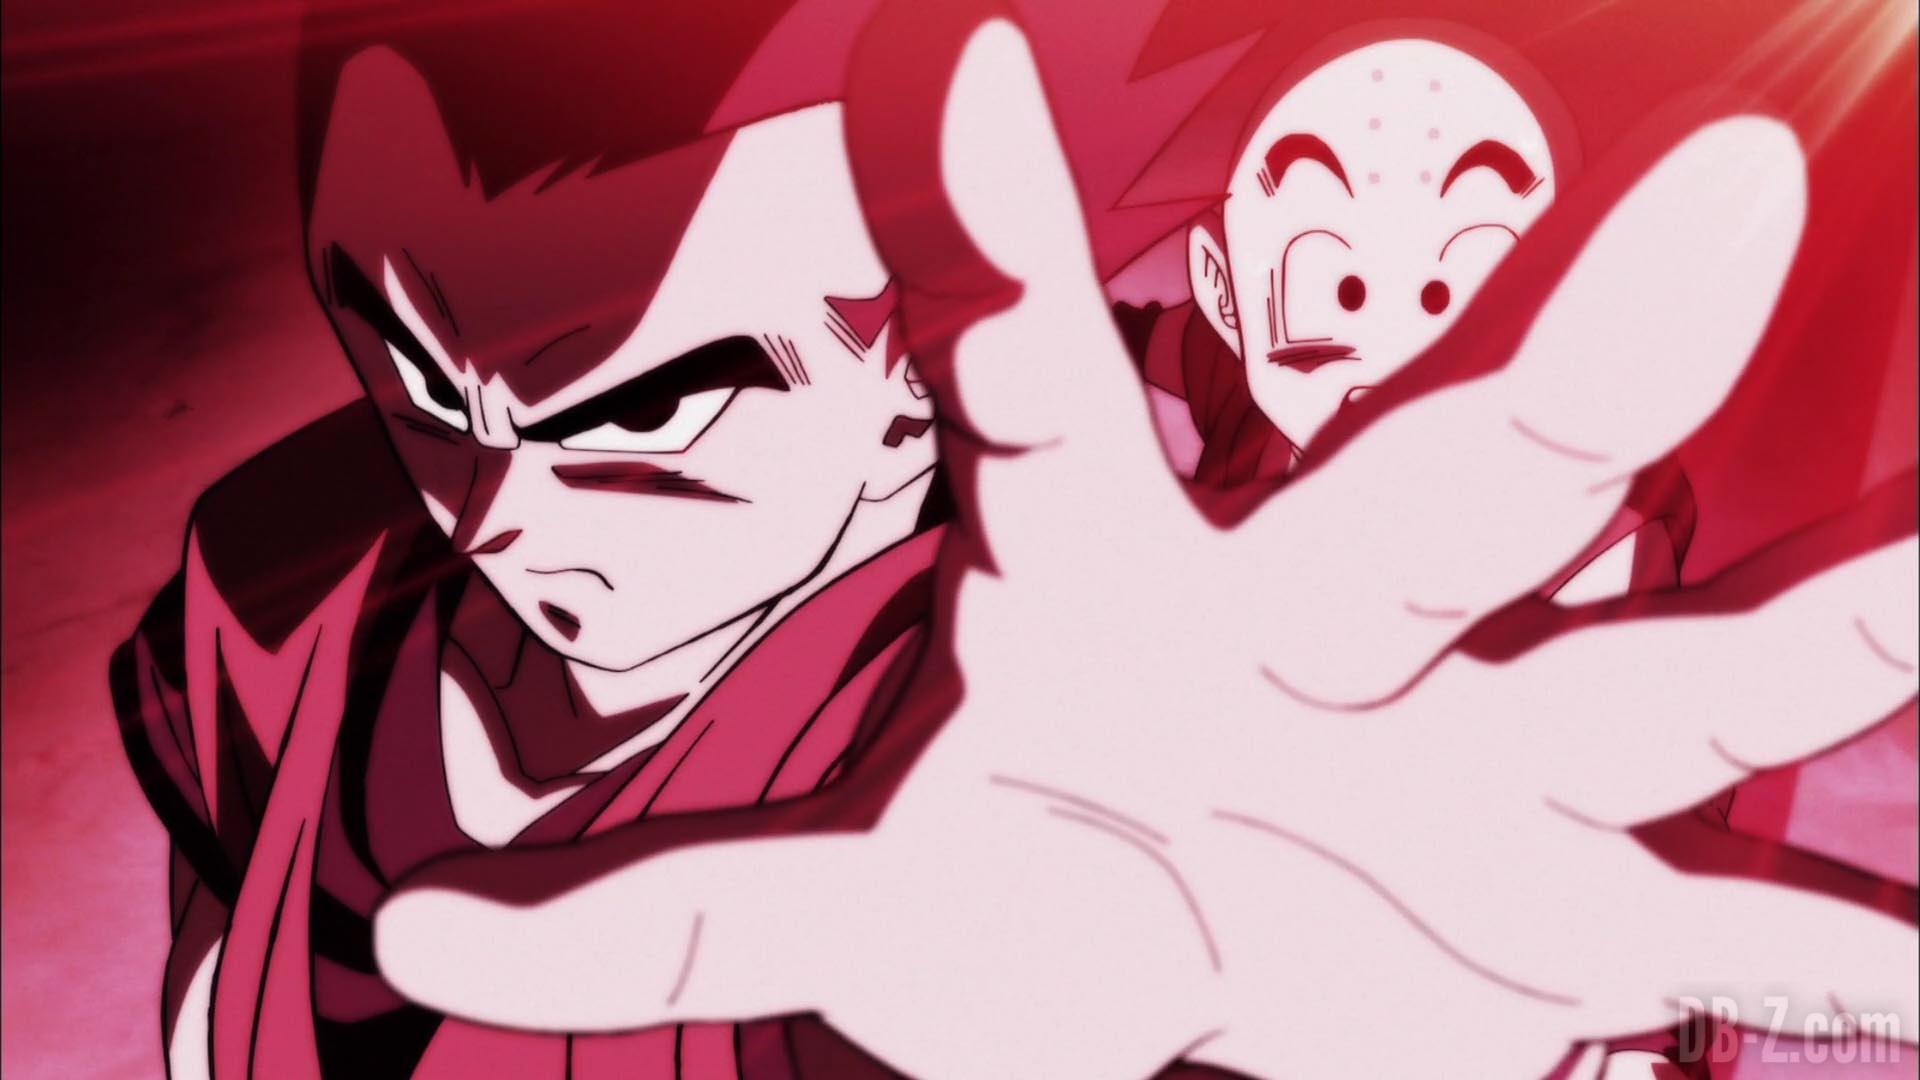 Dragon-Ball-Super-Episode-99-40-Krilin-G